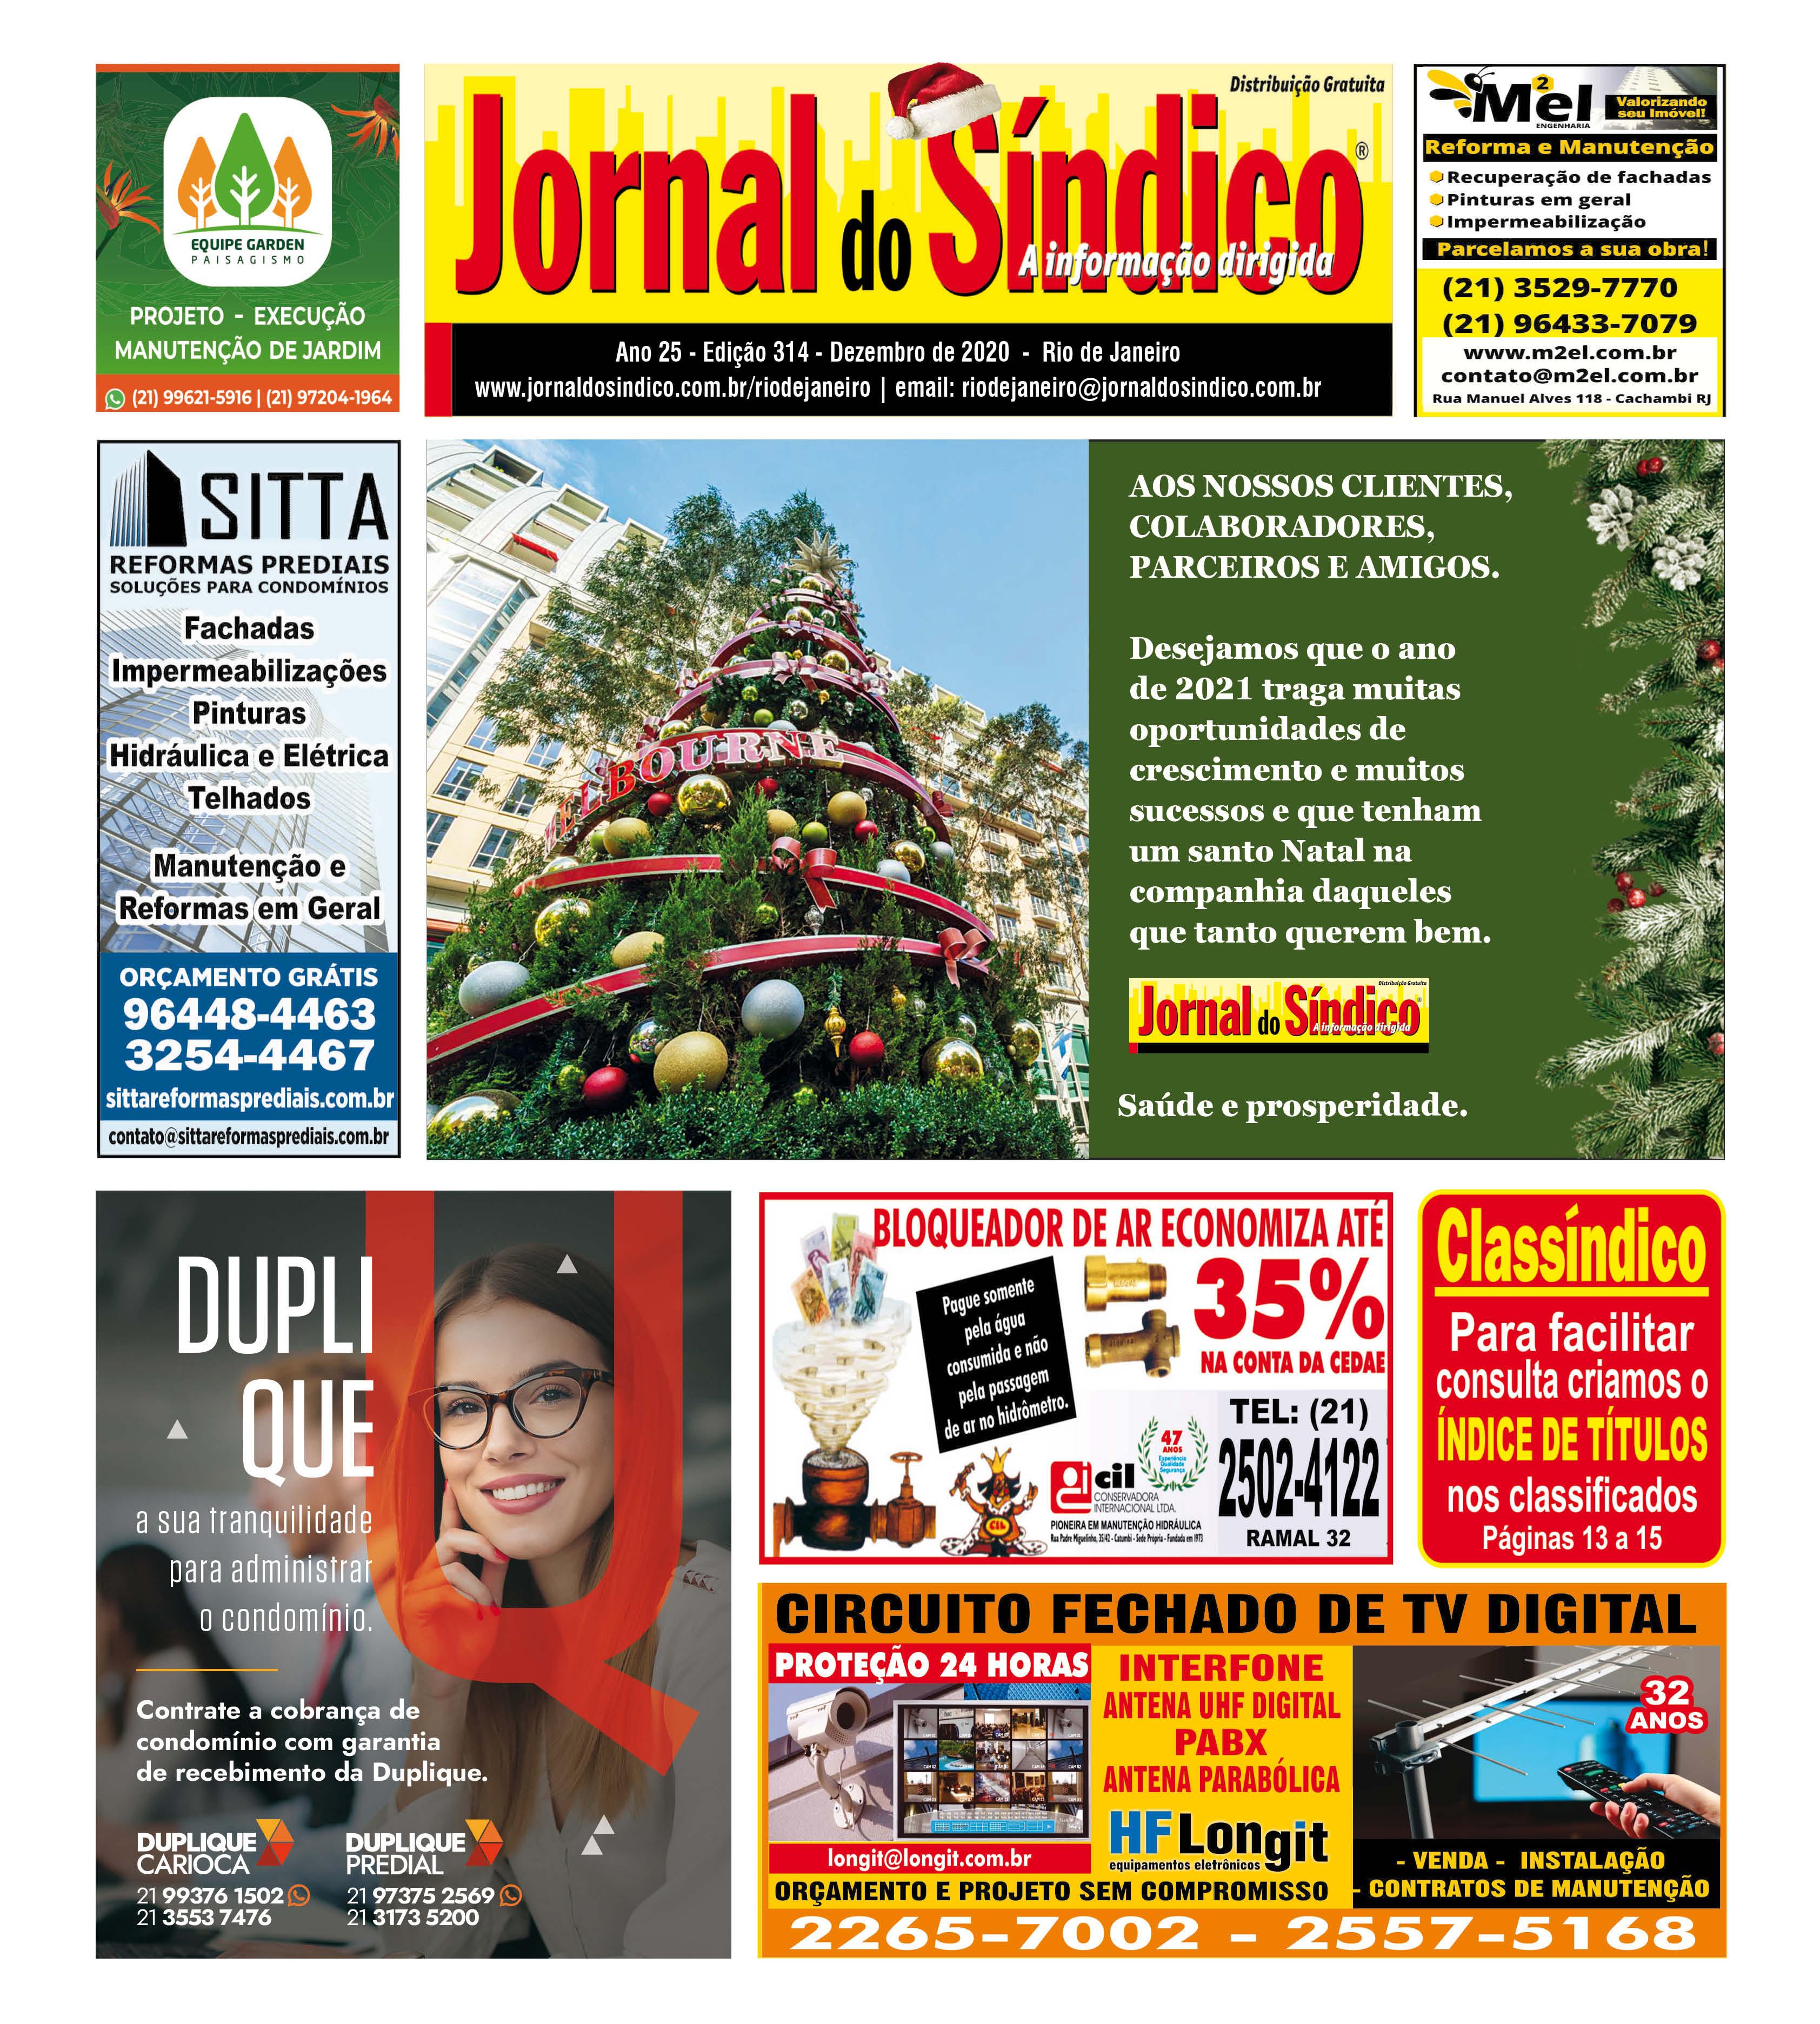 JSRJ 314 - DEZEMBRO 2020 - 12 paginas_WEB